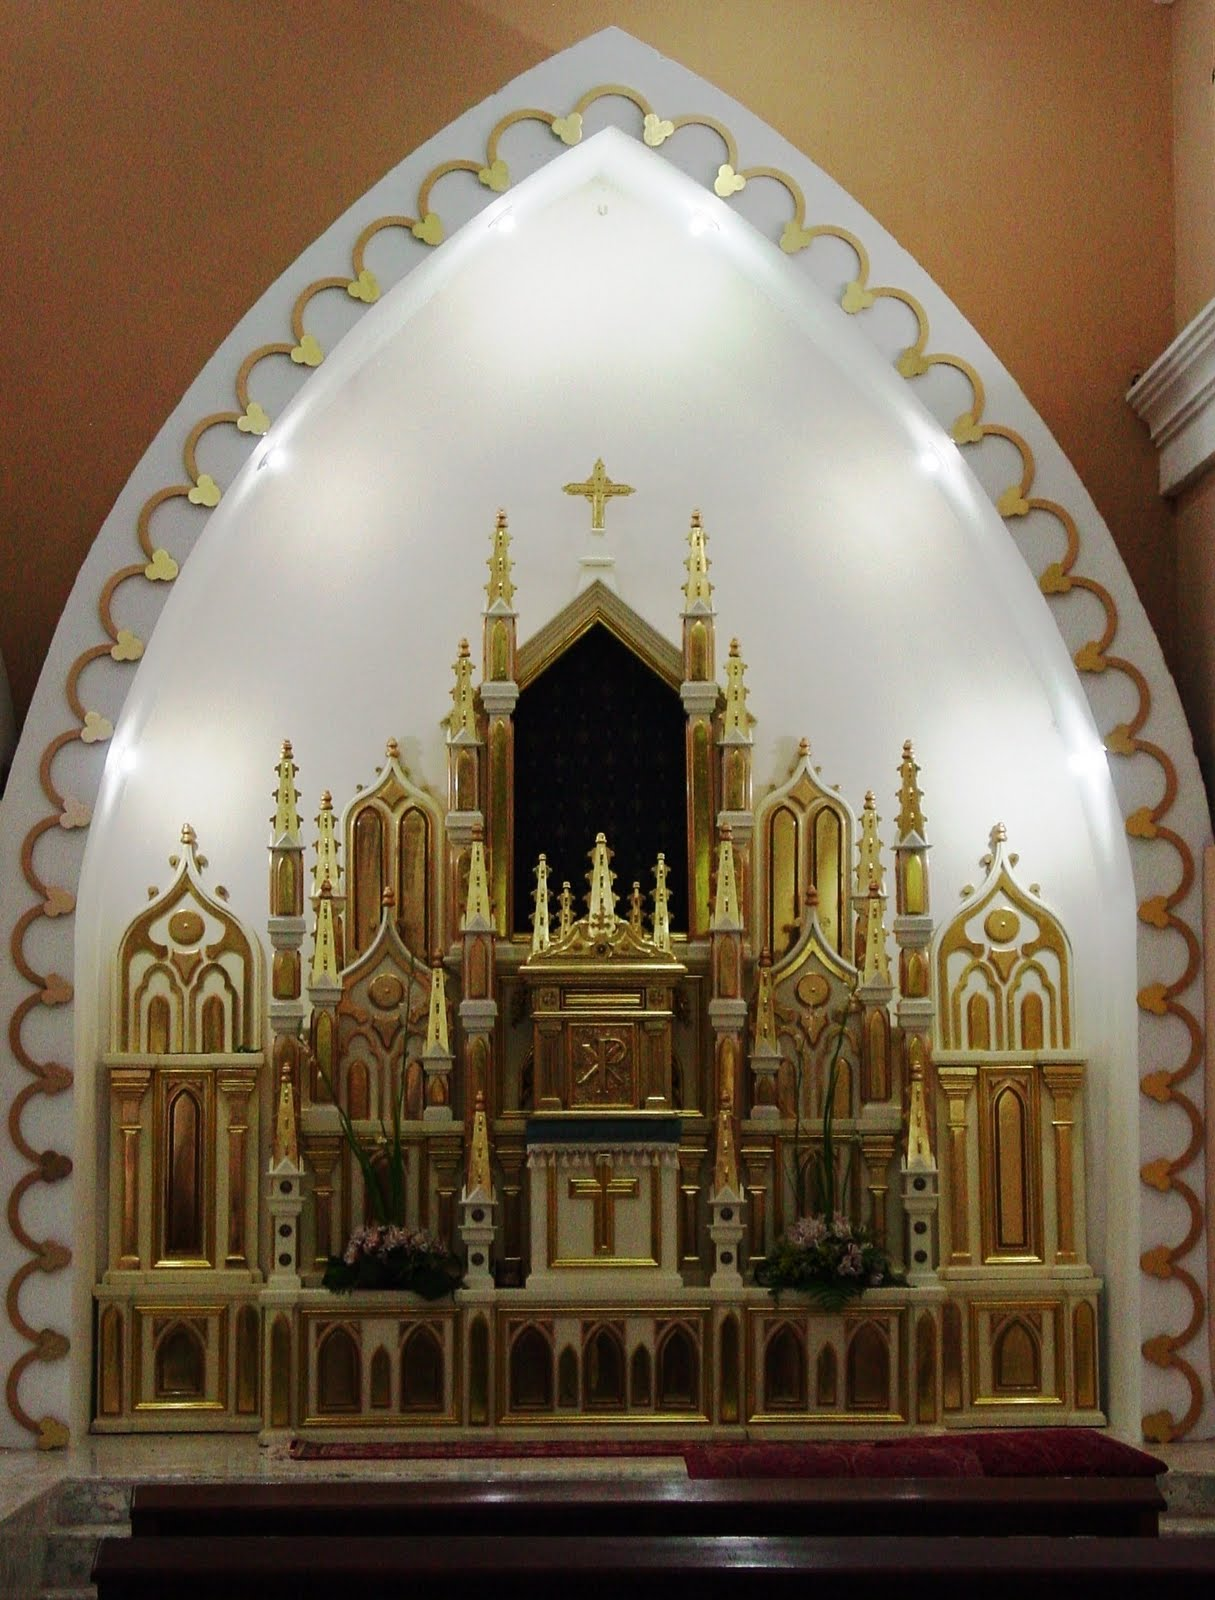 Retablos laterales iglesia ntra de aranzazu edo zulia for Arquitectura sacro